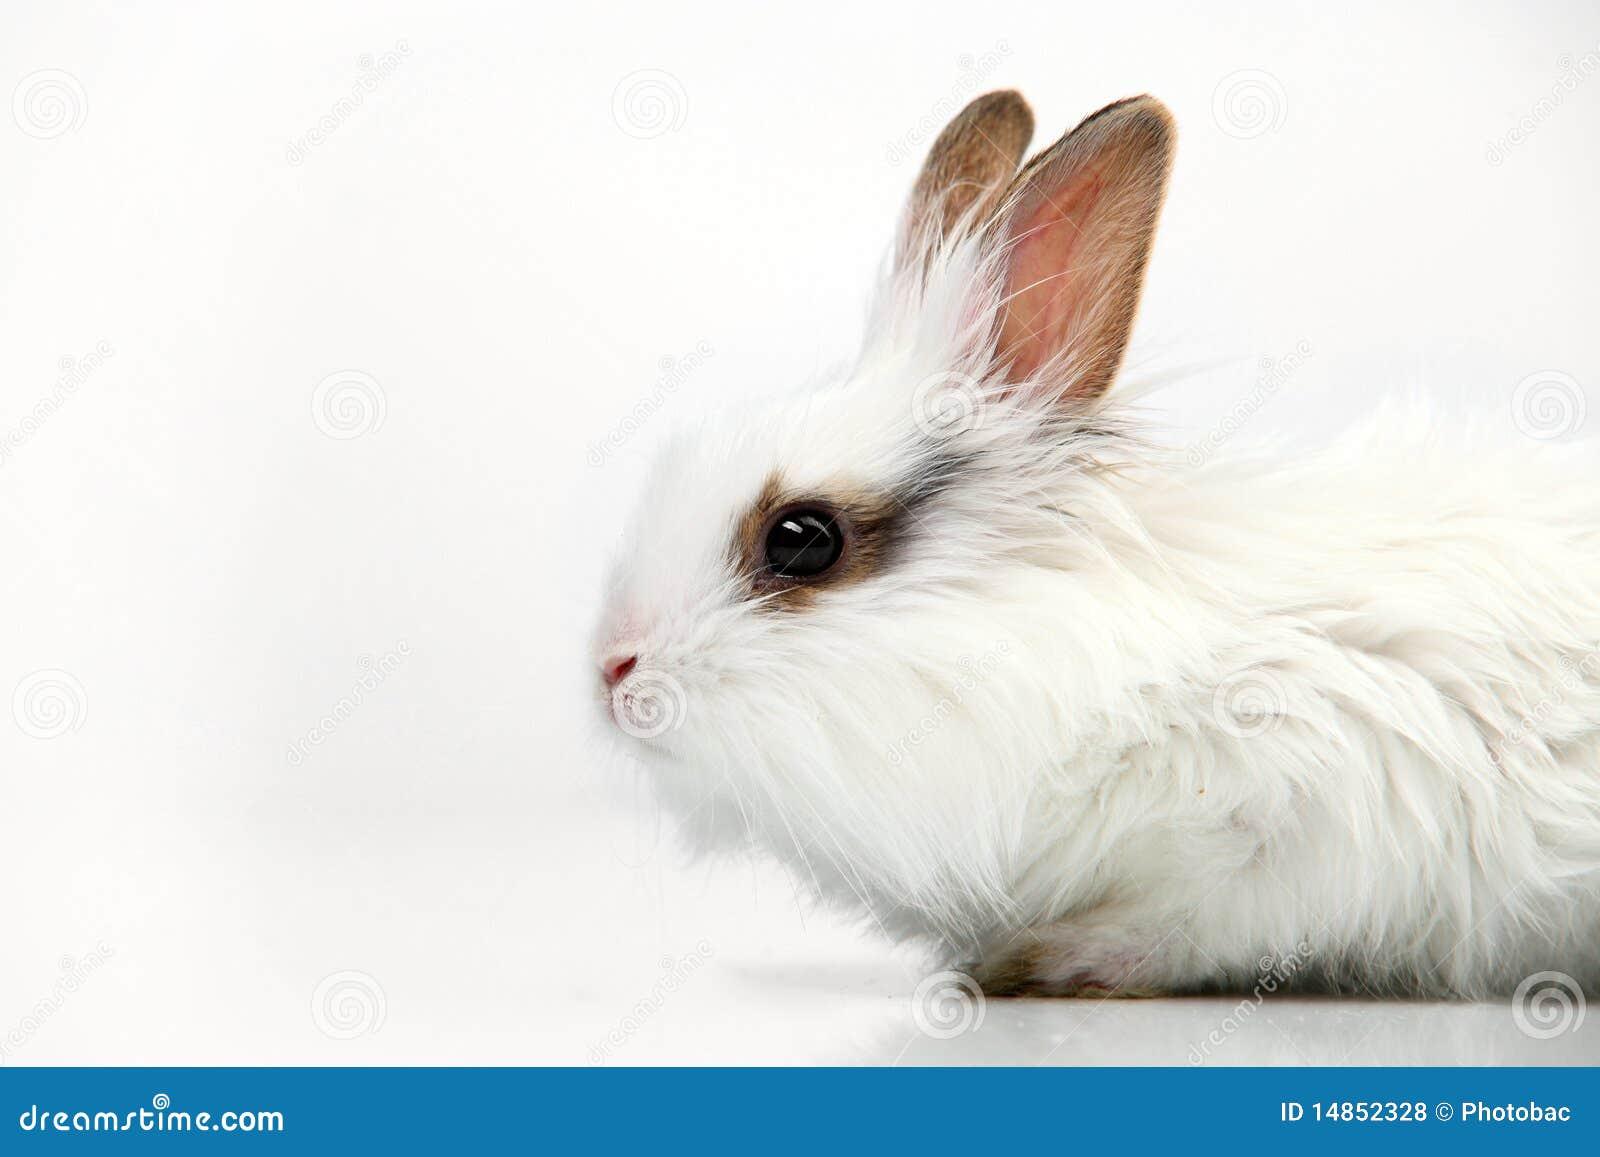 White fancy rabbit on white background